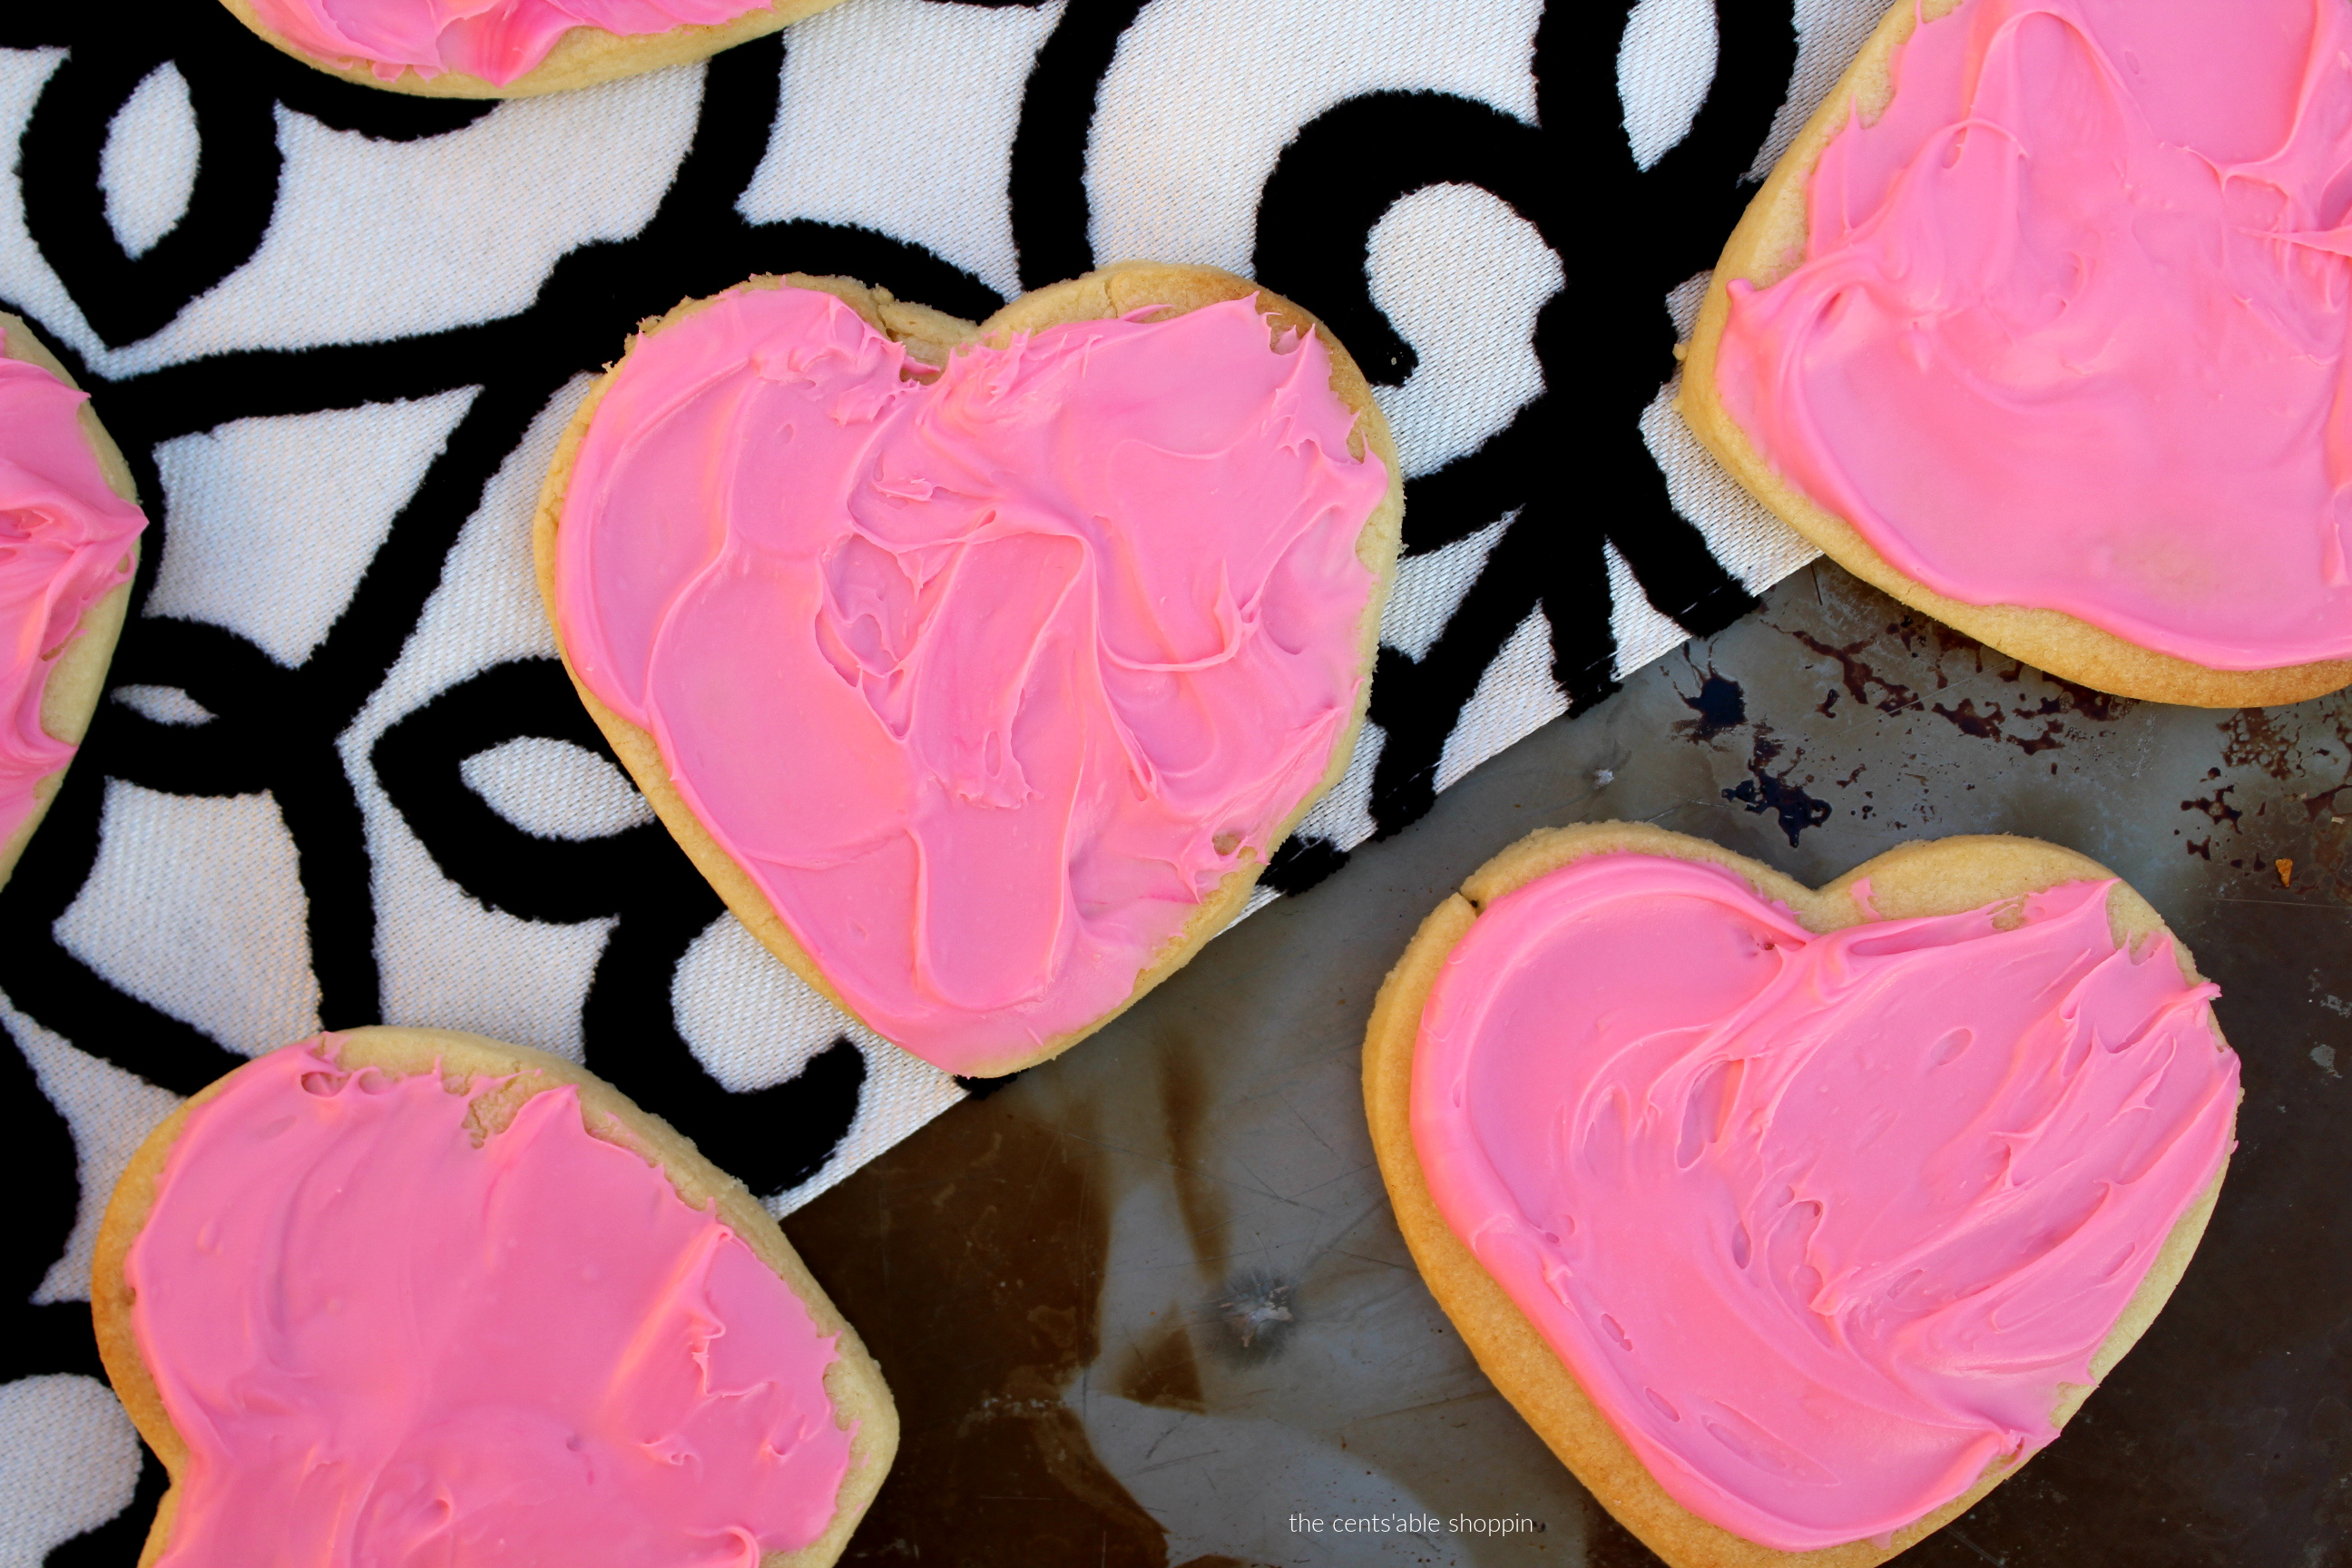 Best Cut-Out Sugar Cookies